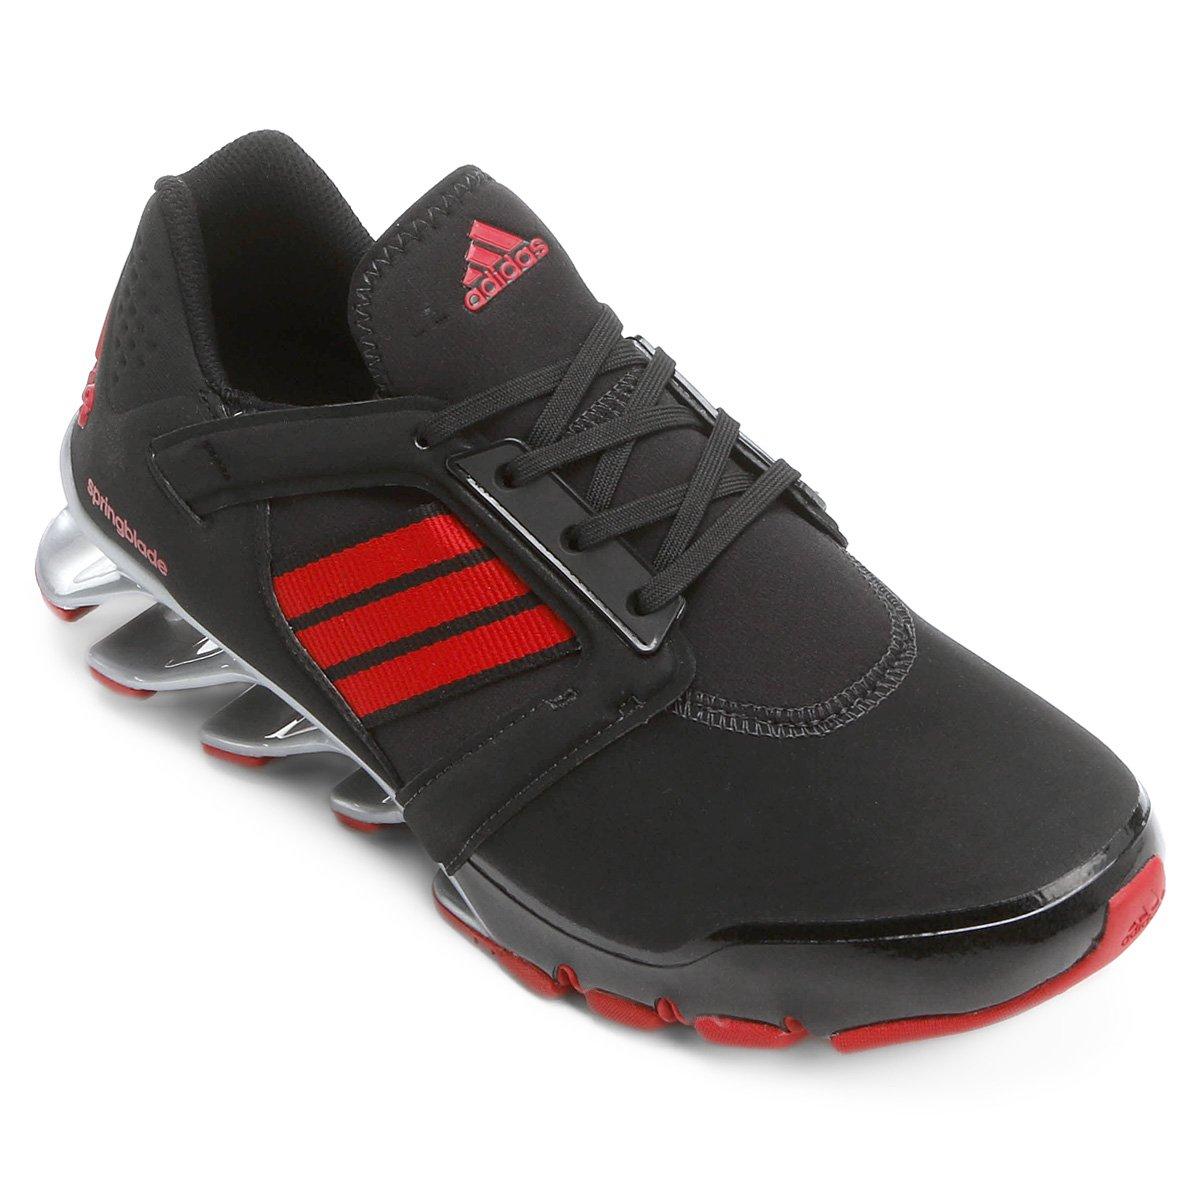 53c1e0fdd2edd 02f80 hot tênis adidas springblade e force masculino compre agora netshoes  5675a 5b7ad ...